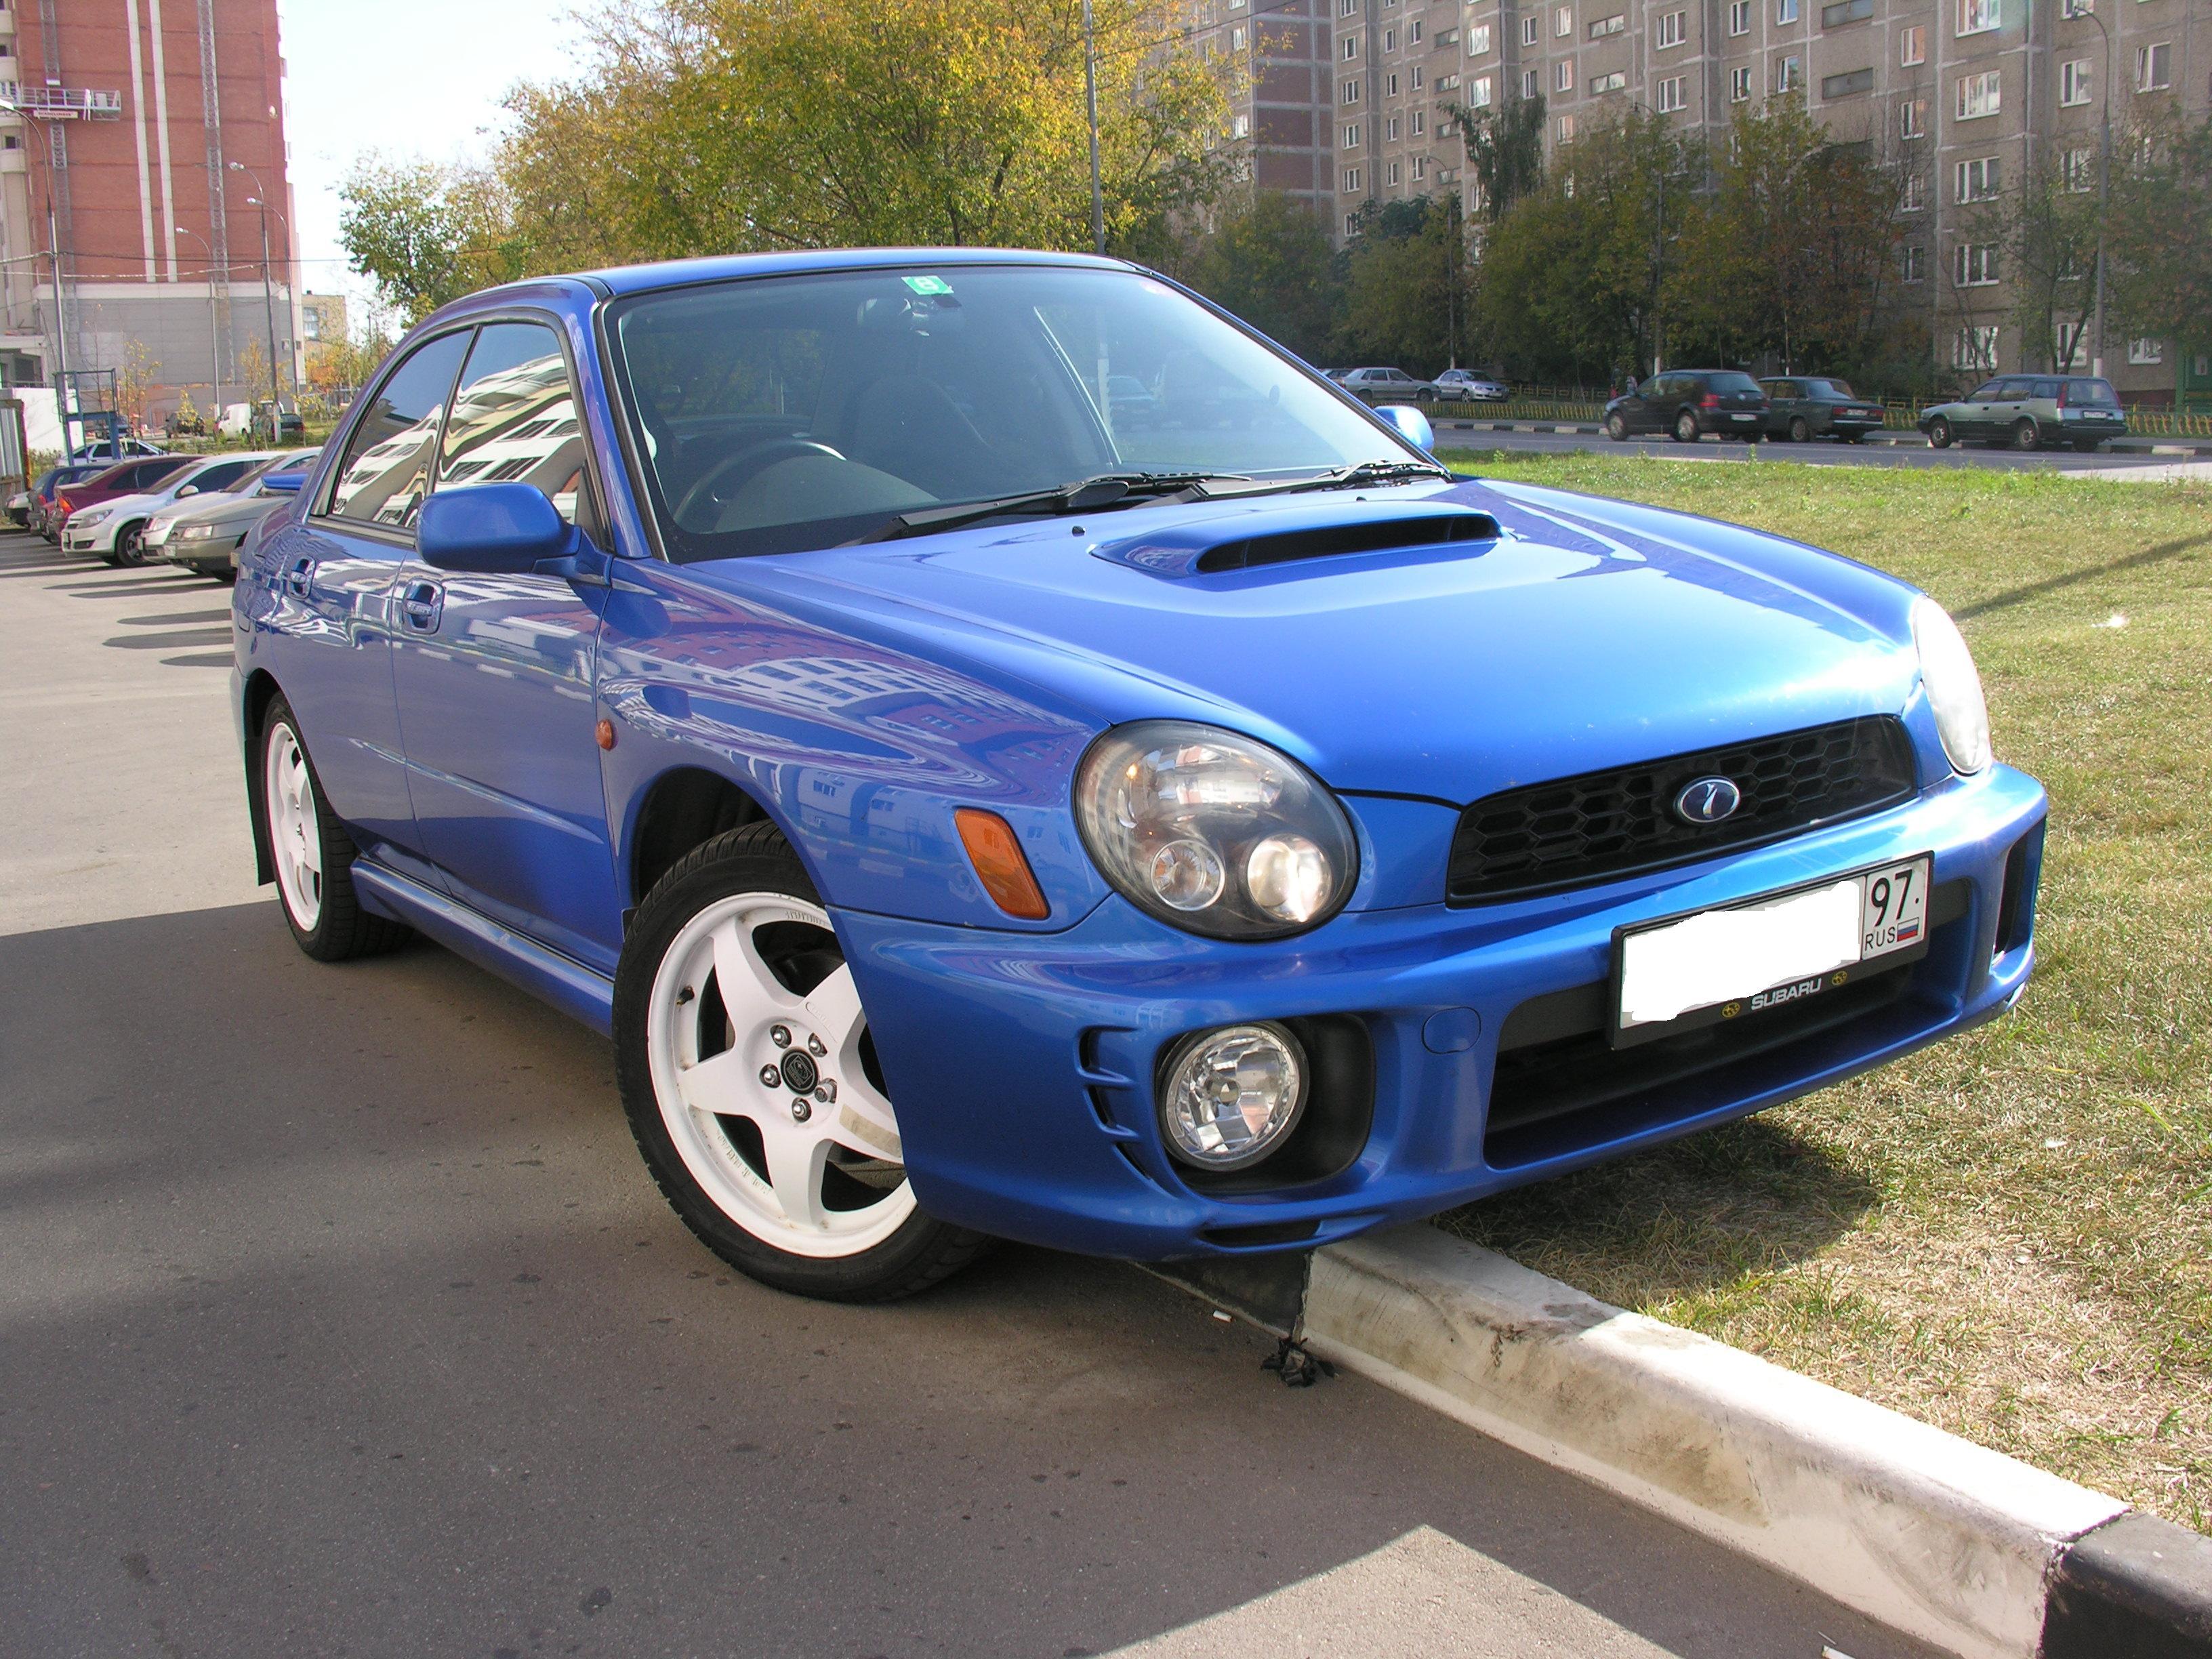 2000 Subaru Impreza Wrx Pictures 2000cc Gasoline